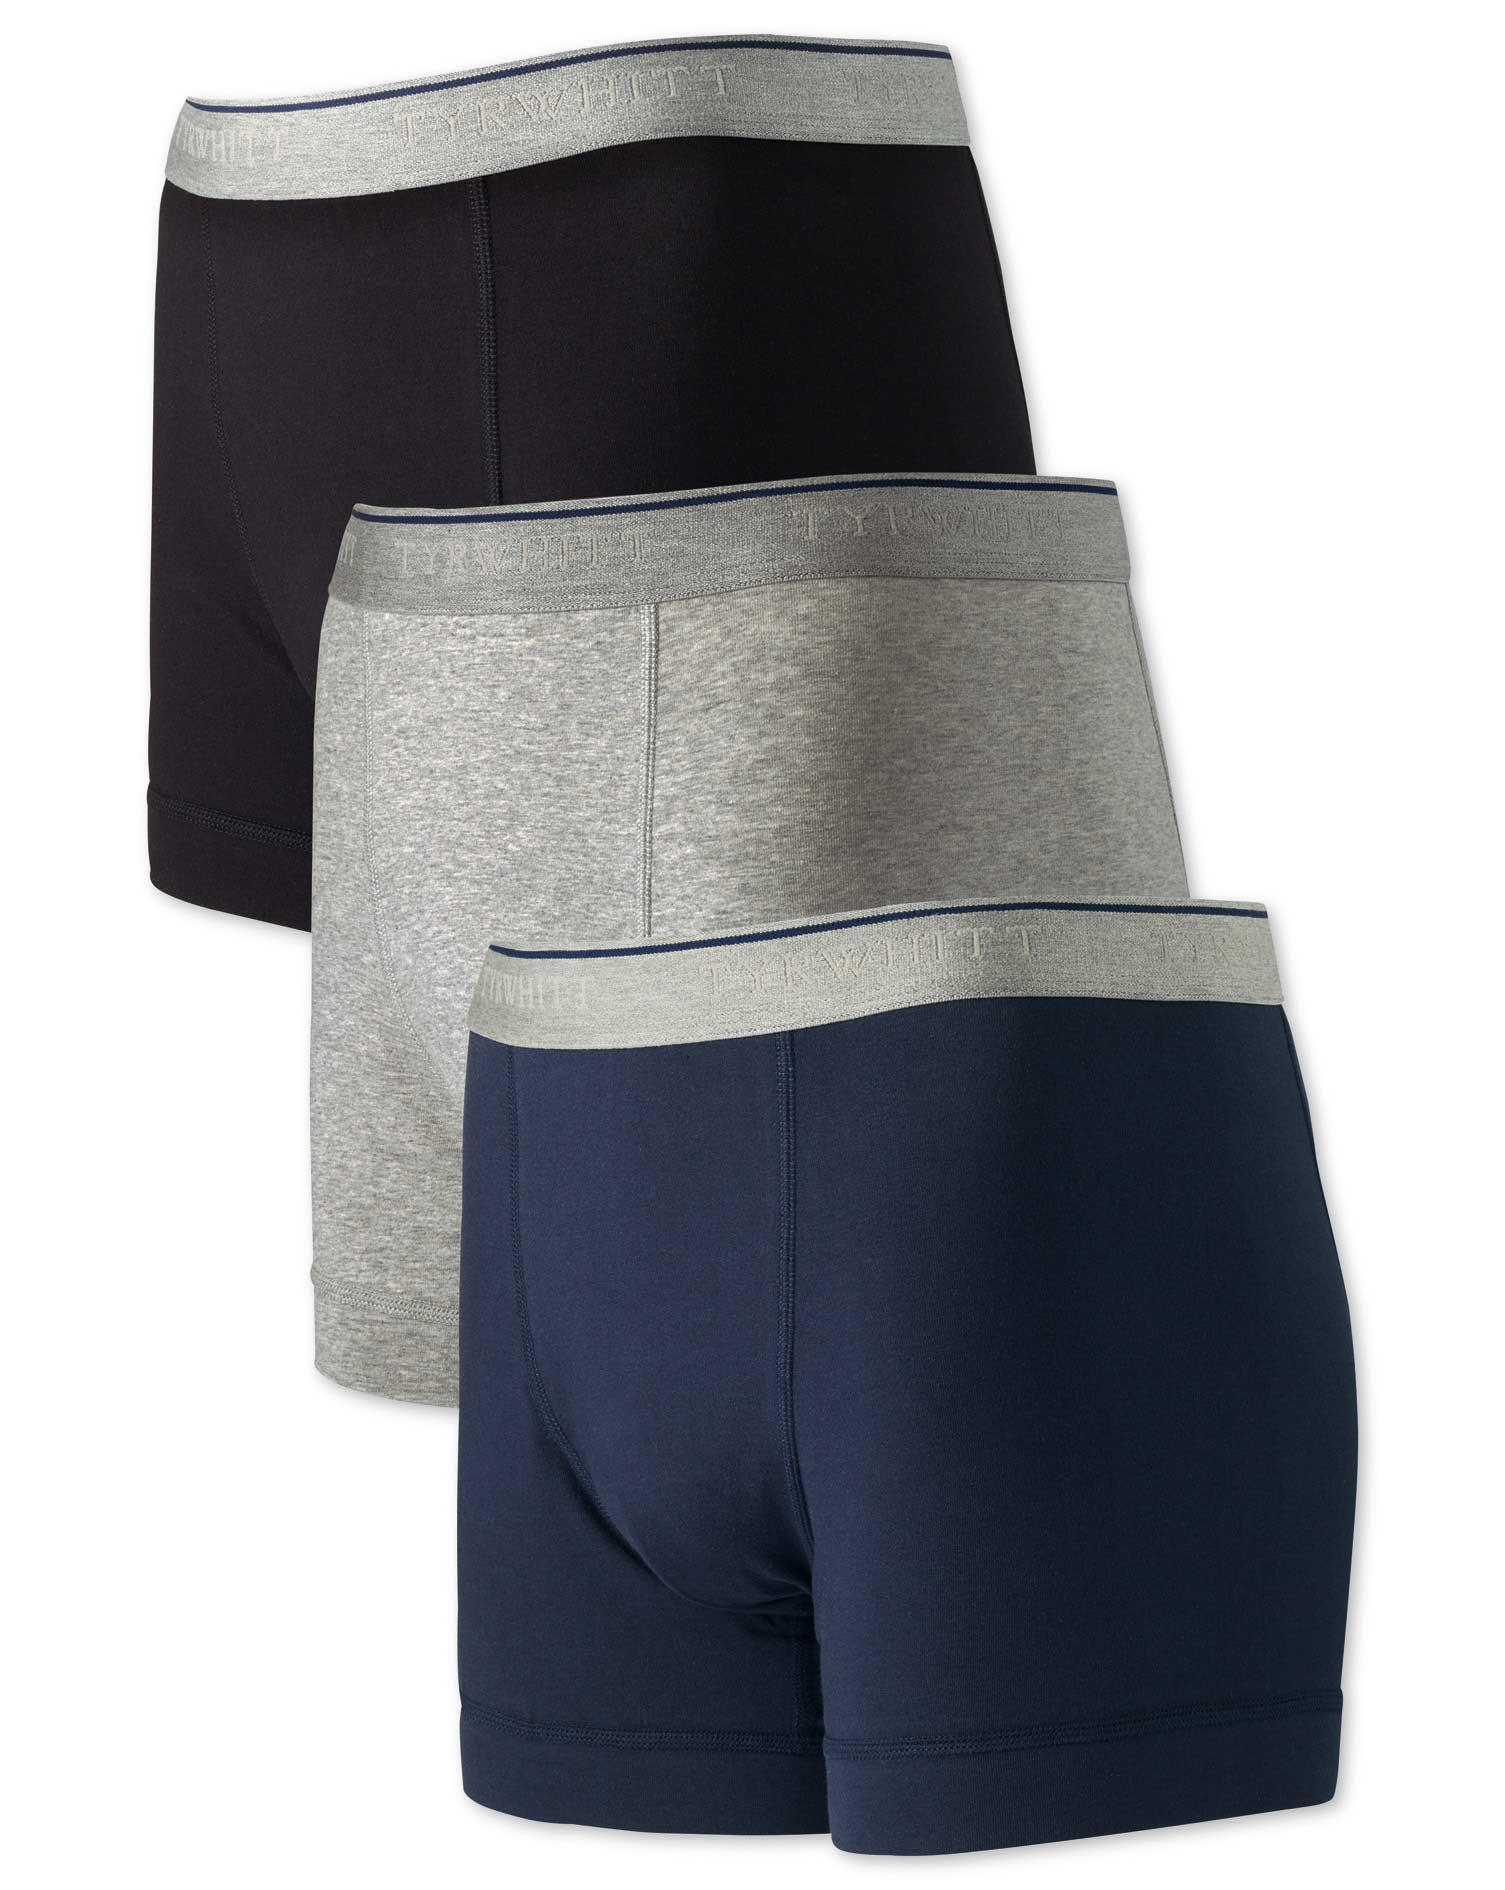 Multi Jersey 3 Pack Trunks Size XXL by Charles Tyrwhitt